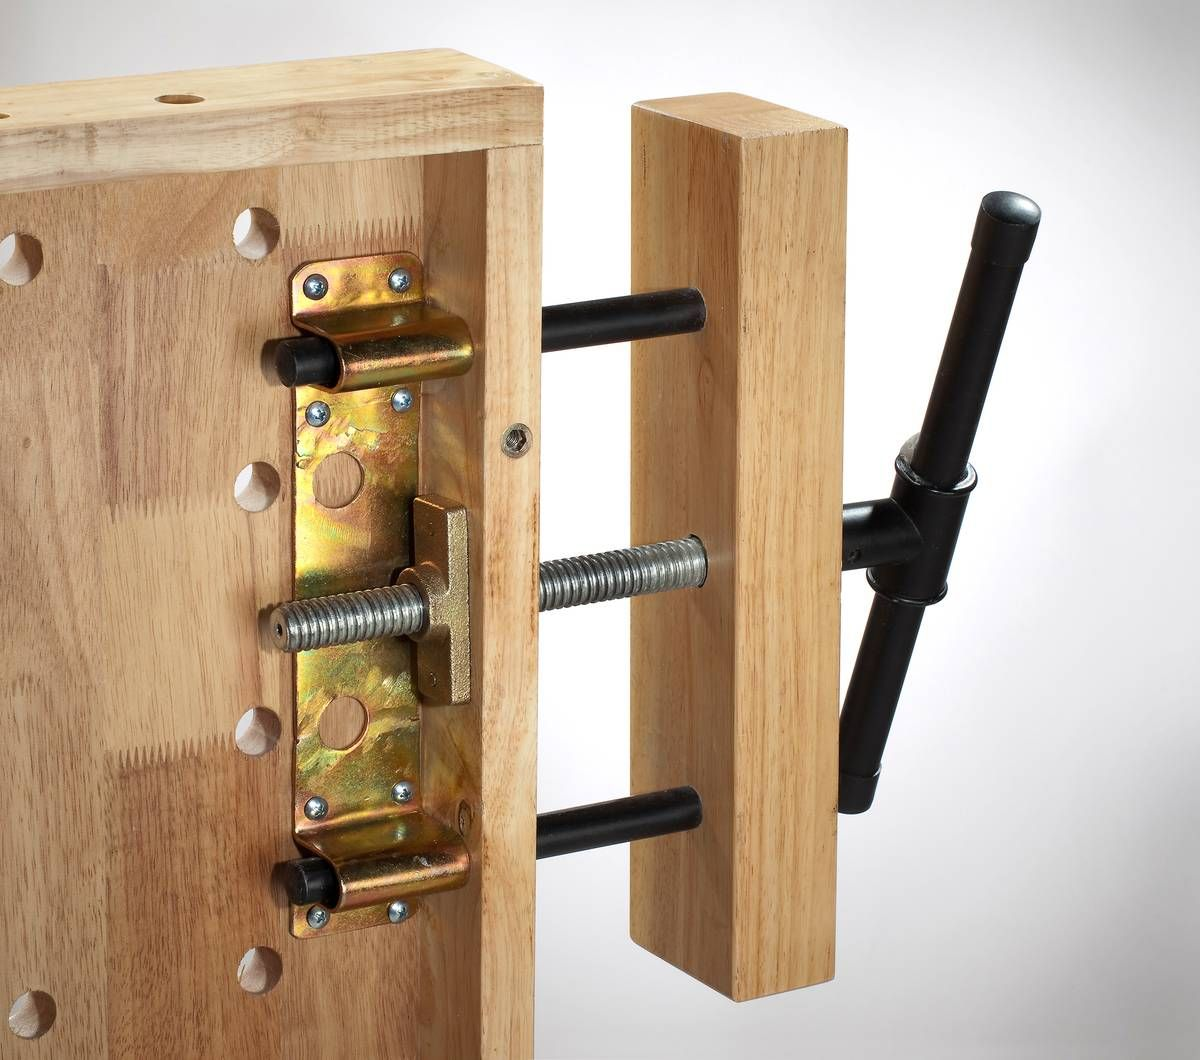 Sehr Klemmvorrichtung für Hobelbank (Diy Wood Work Tools) | Menuiserie PH79